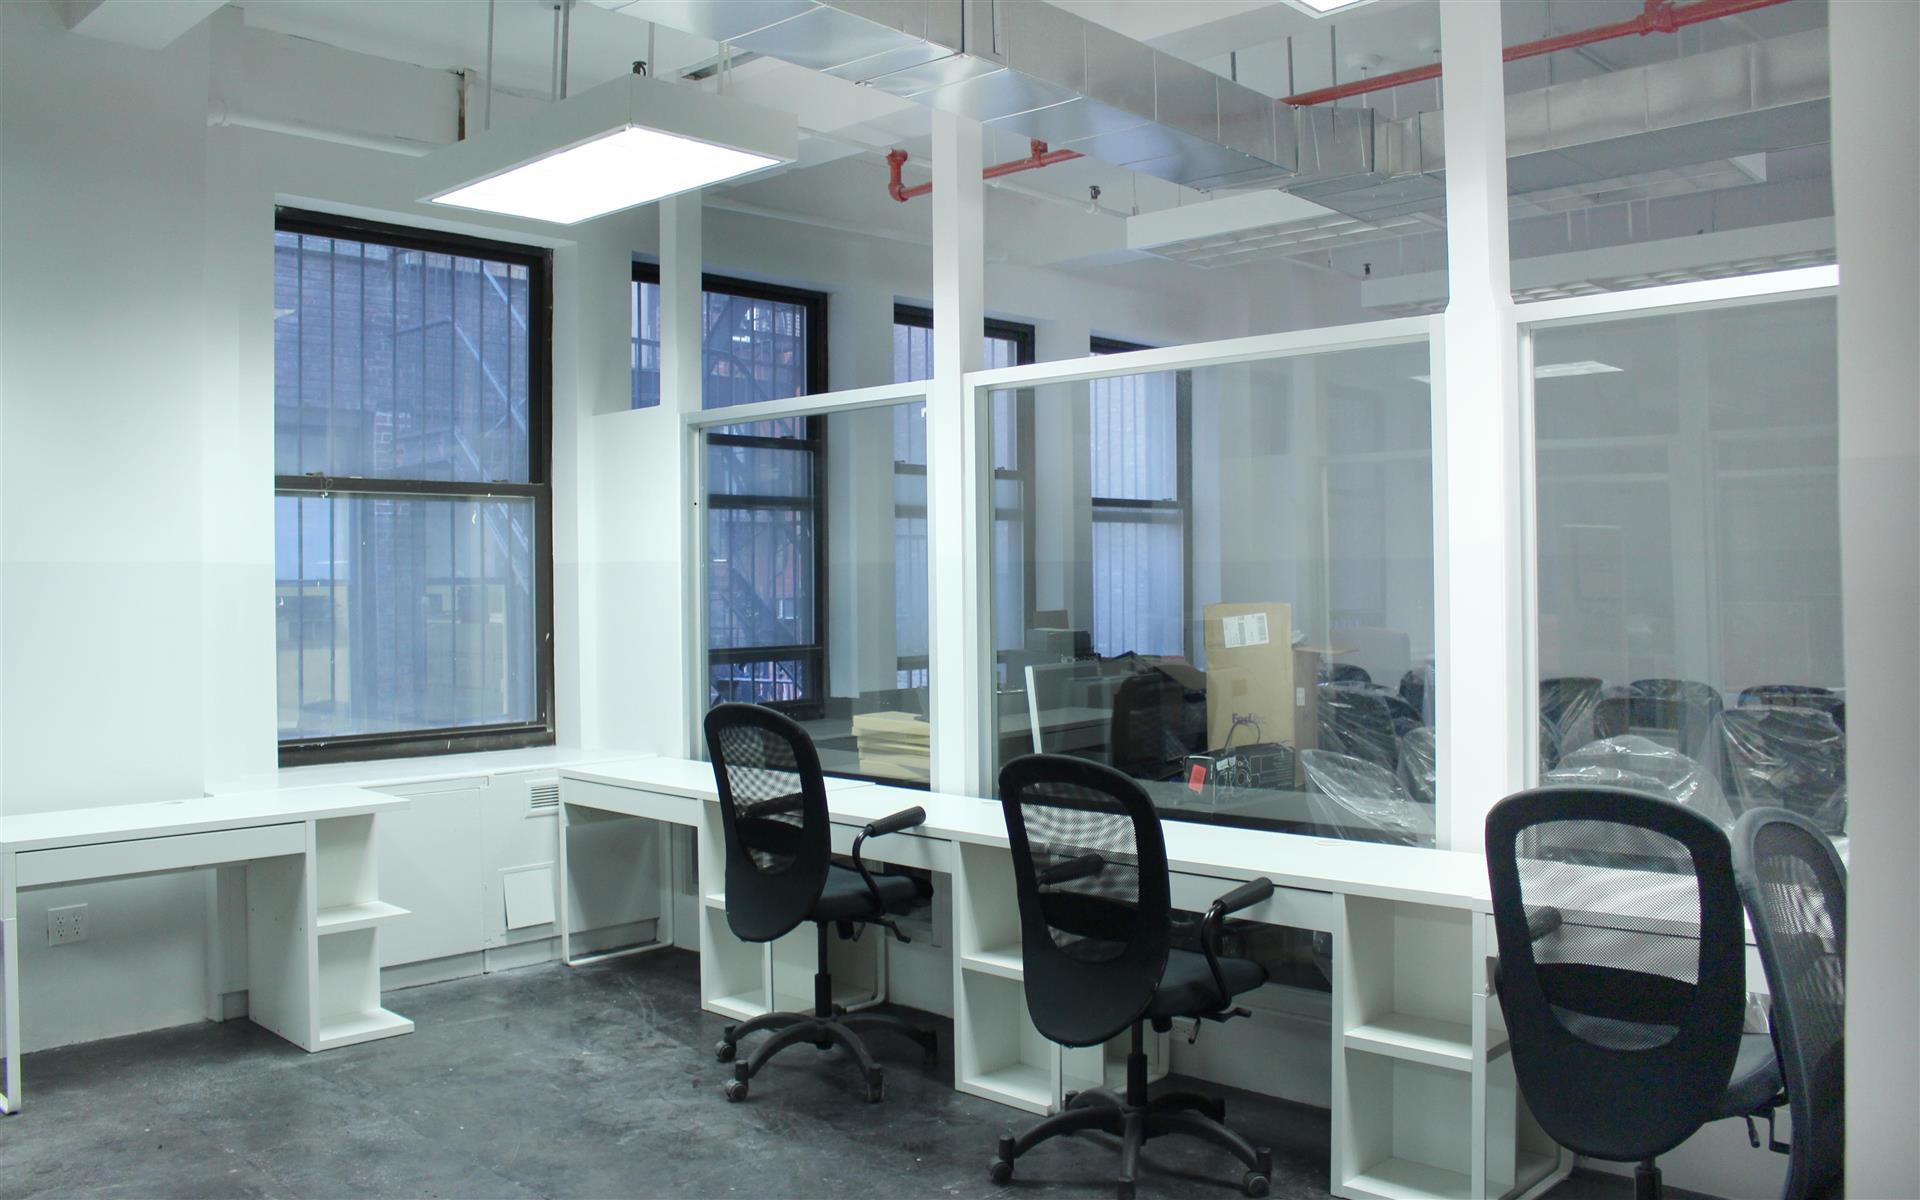 Ensemble - Coworking in Midtown Manhattan - Team Office for 10